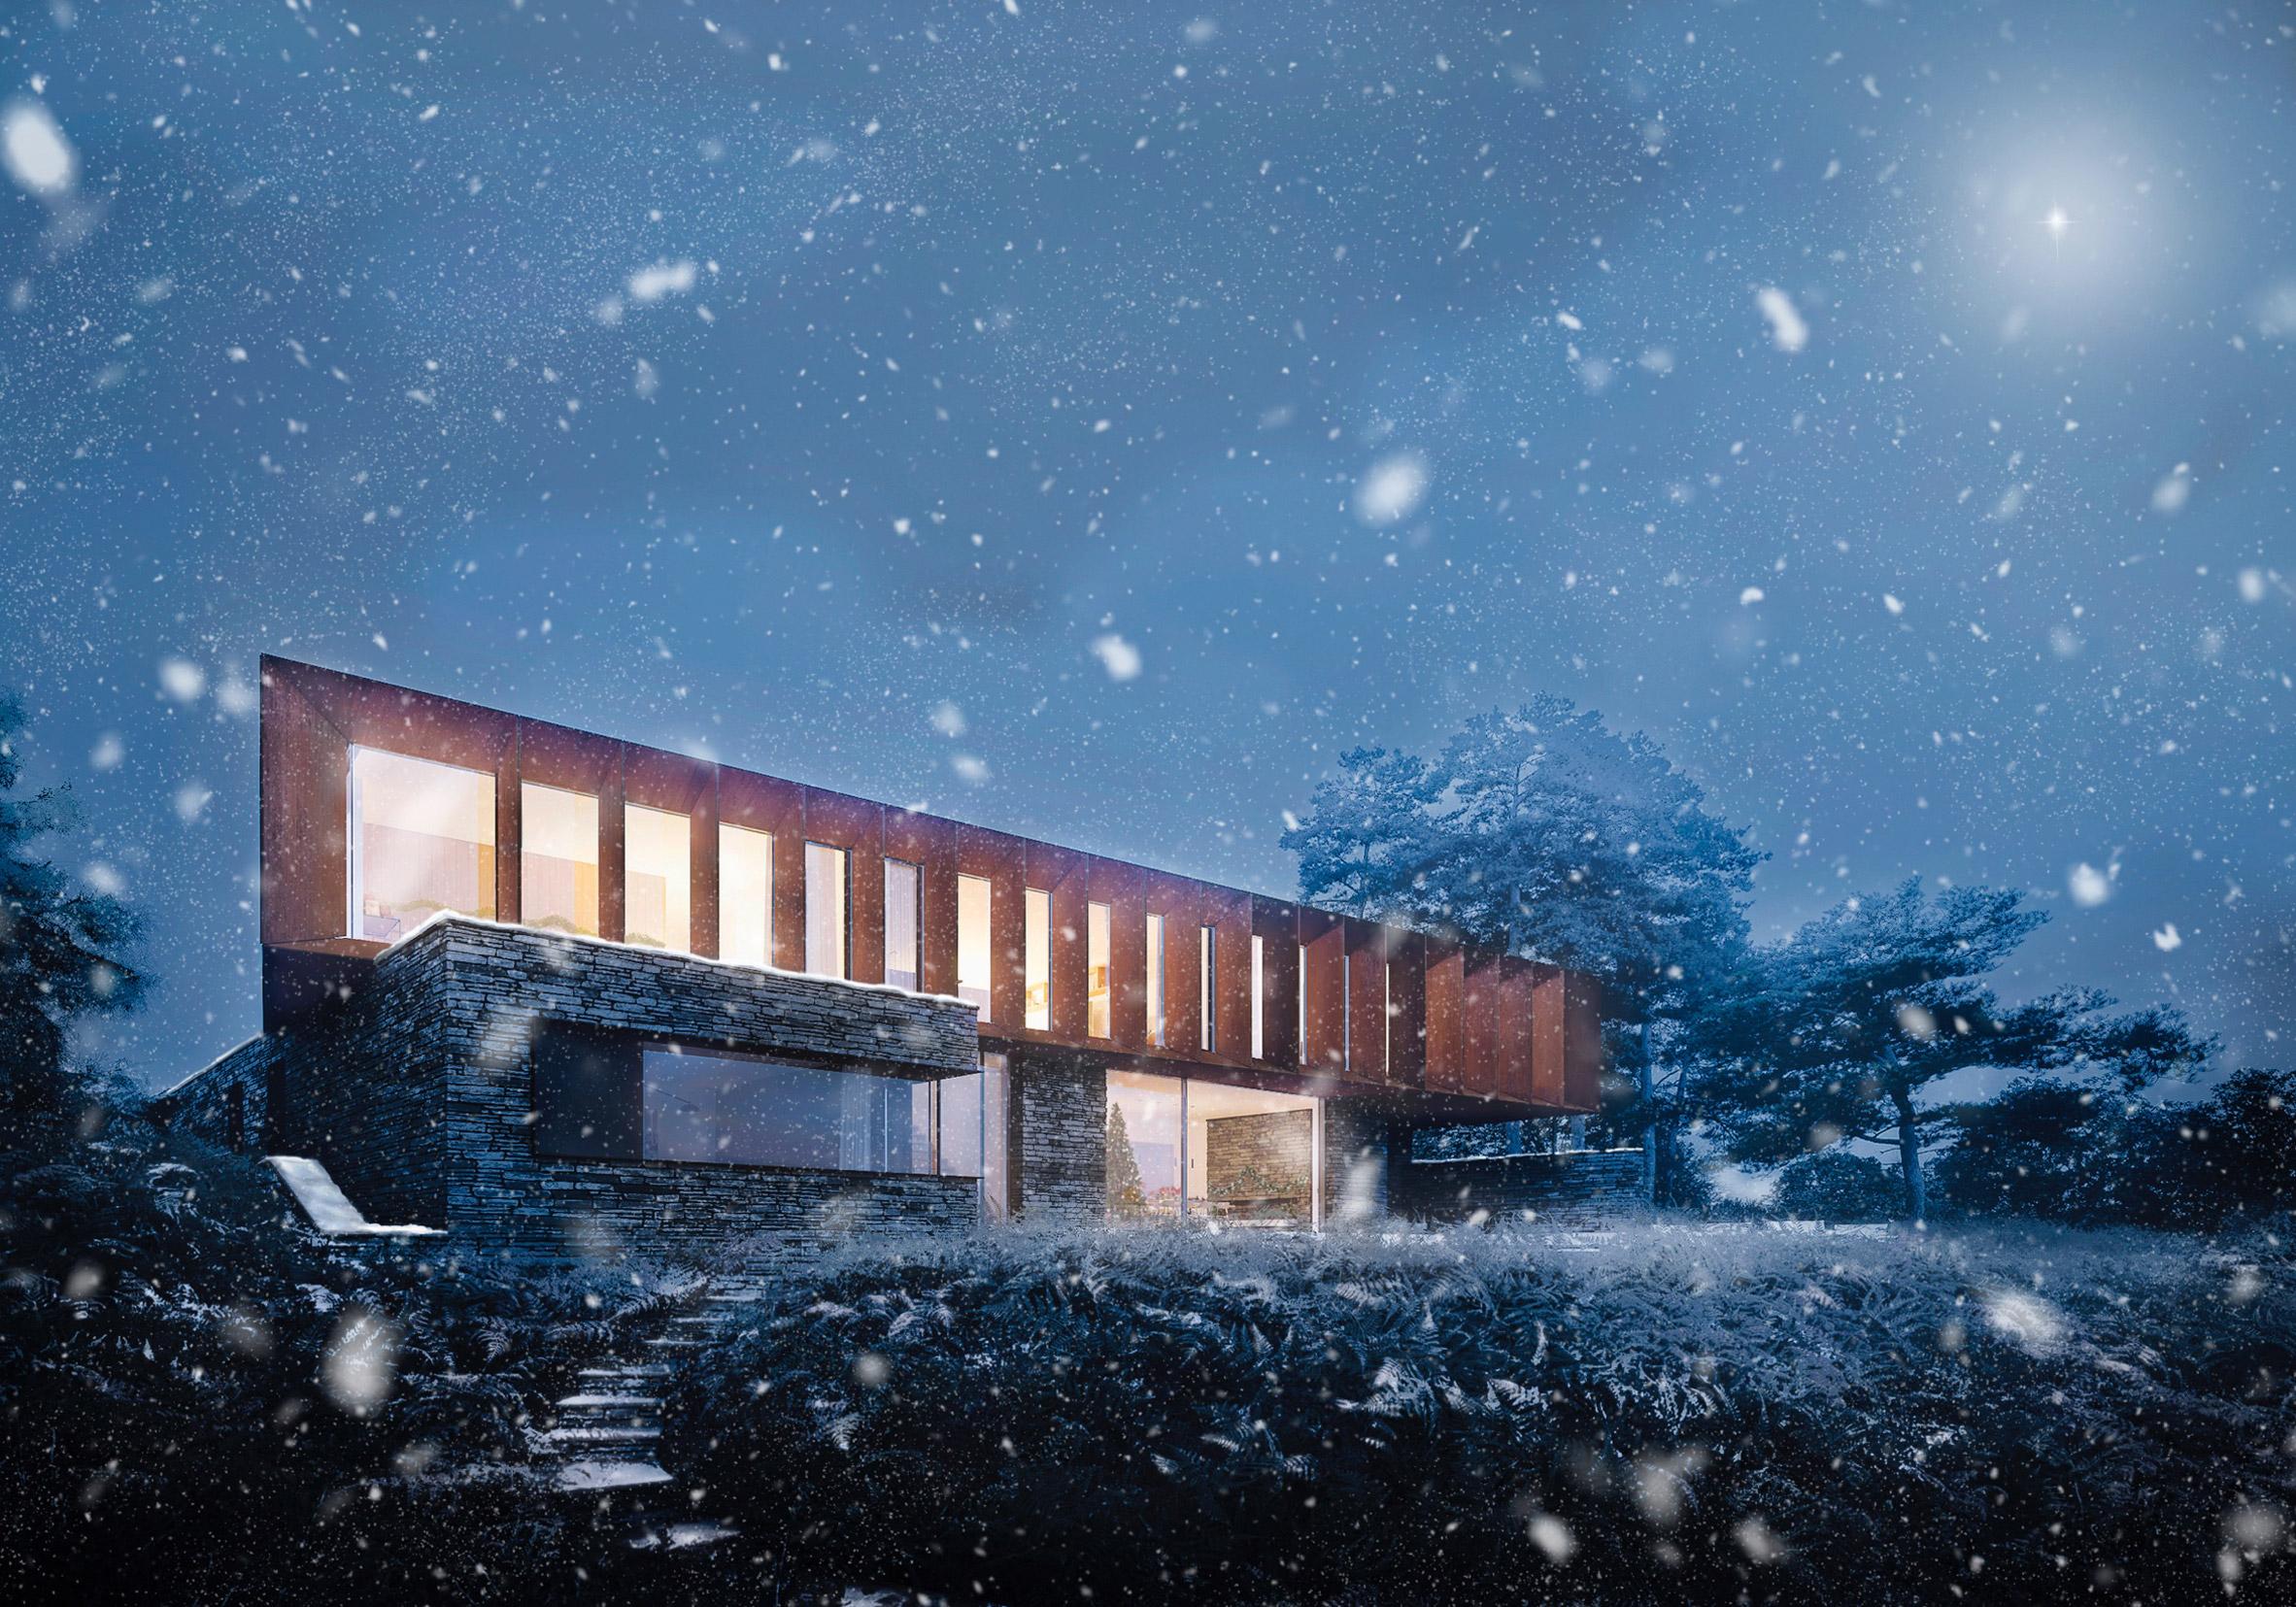 Christmas card by Ström Architects